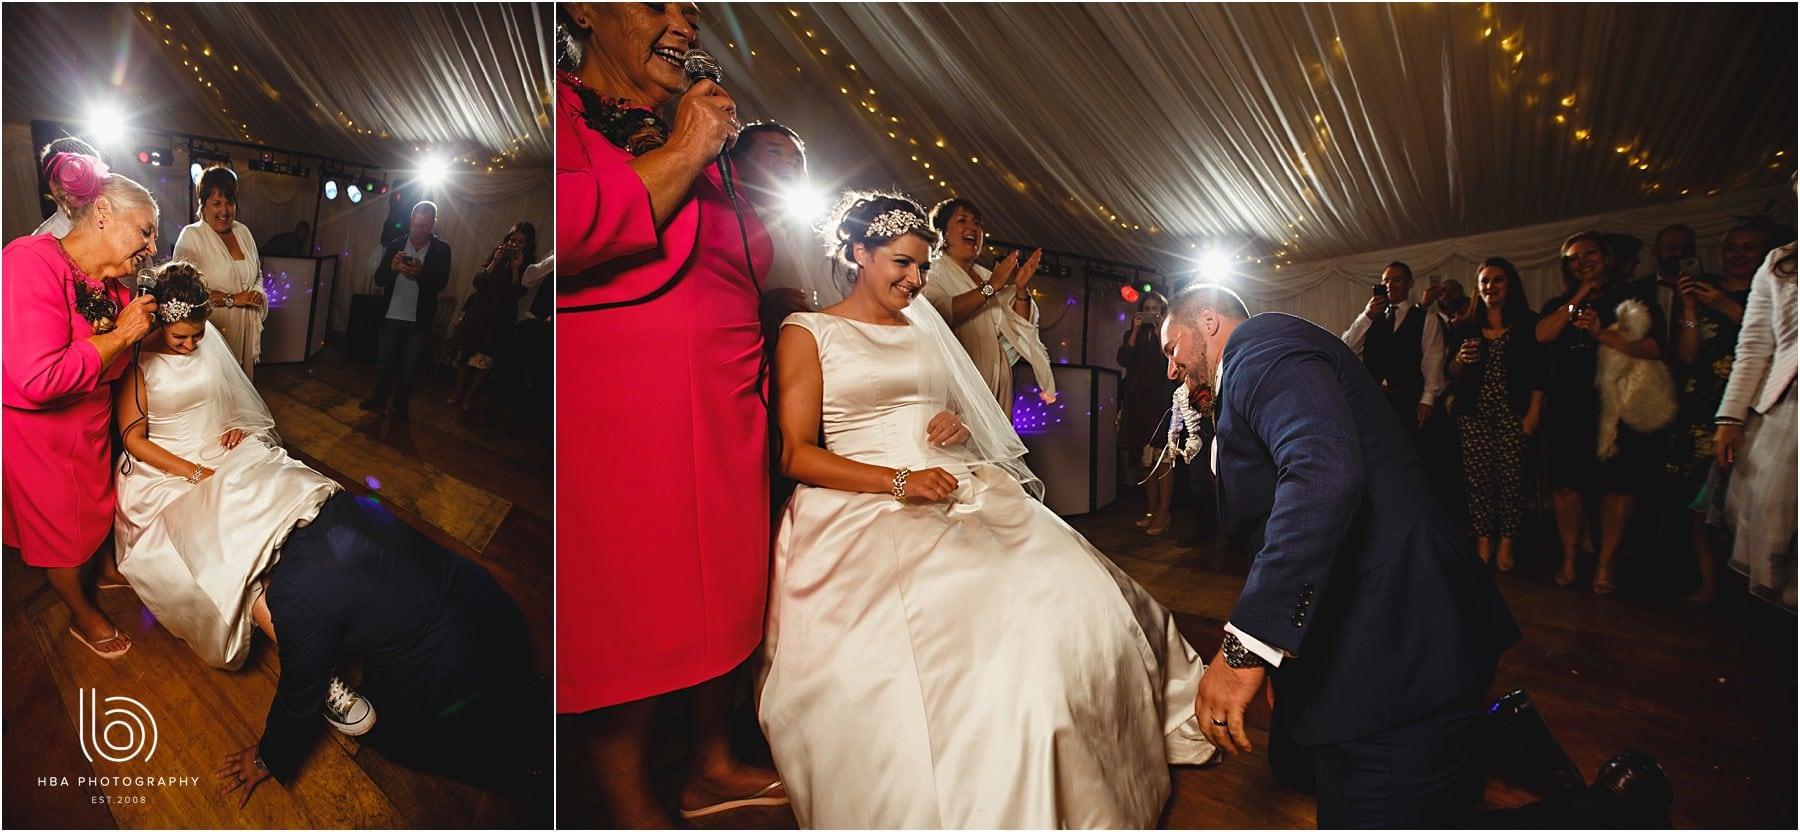 the groom taking off the bride's garter